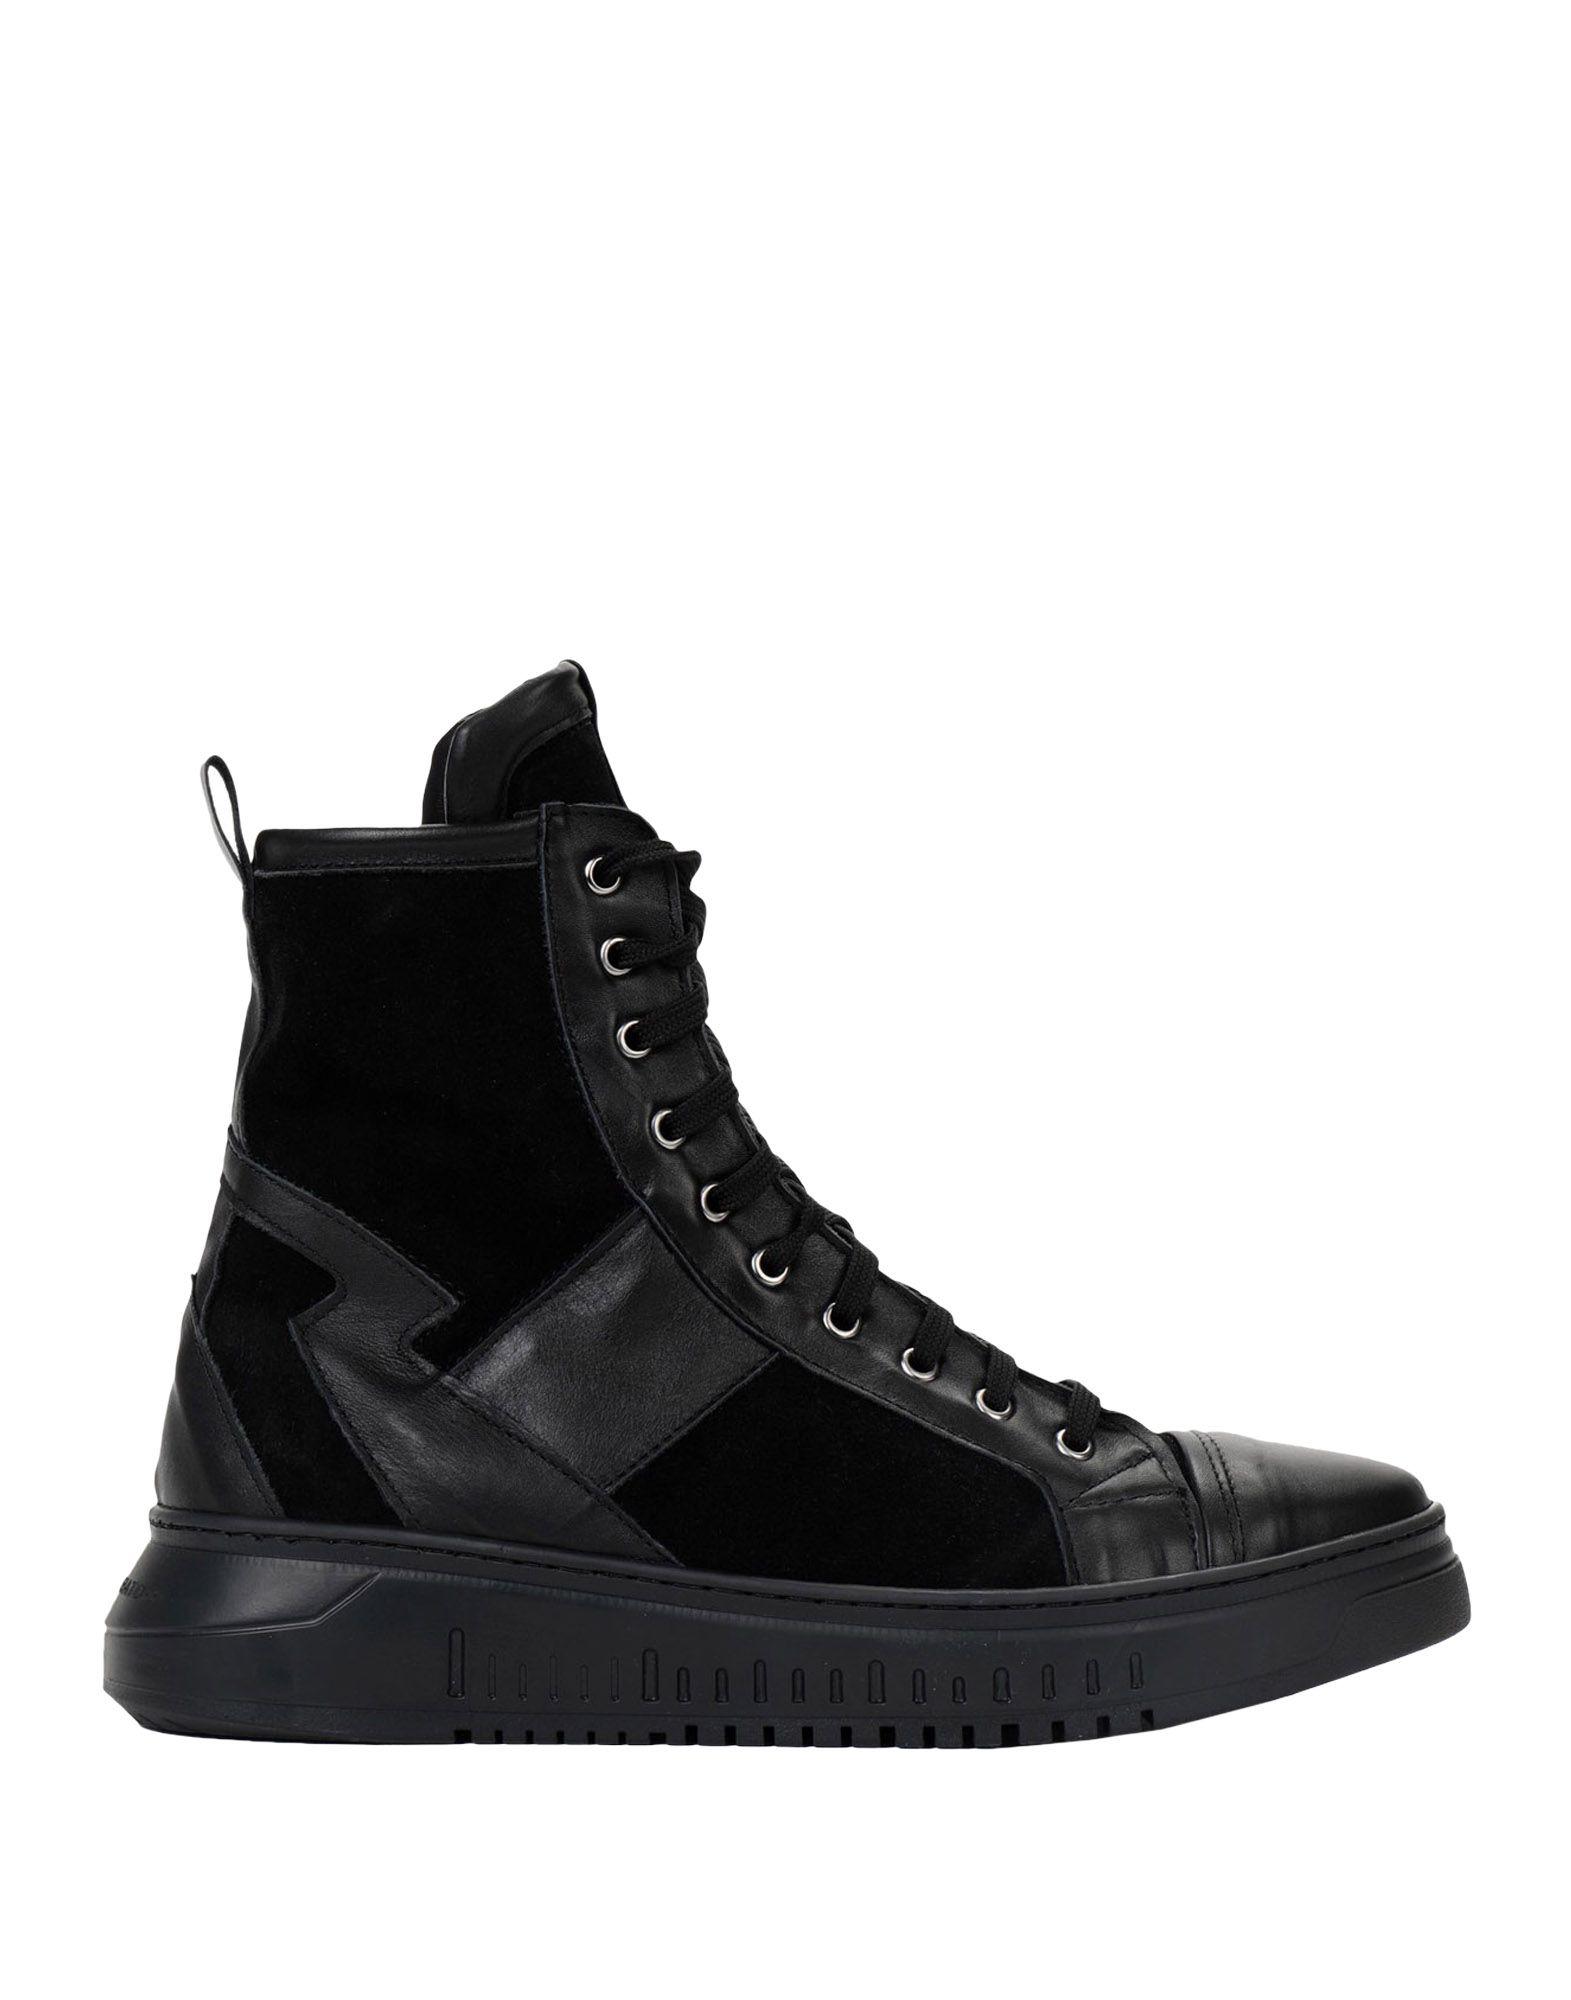 Savio Barbato Sneakers Herren  11540101PO Gute Qualität beliebte Schuhe